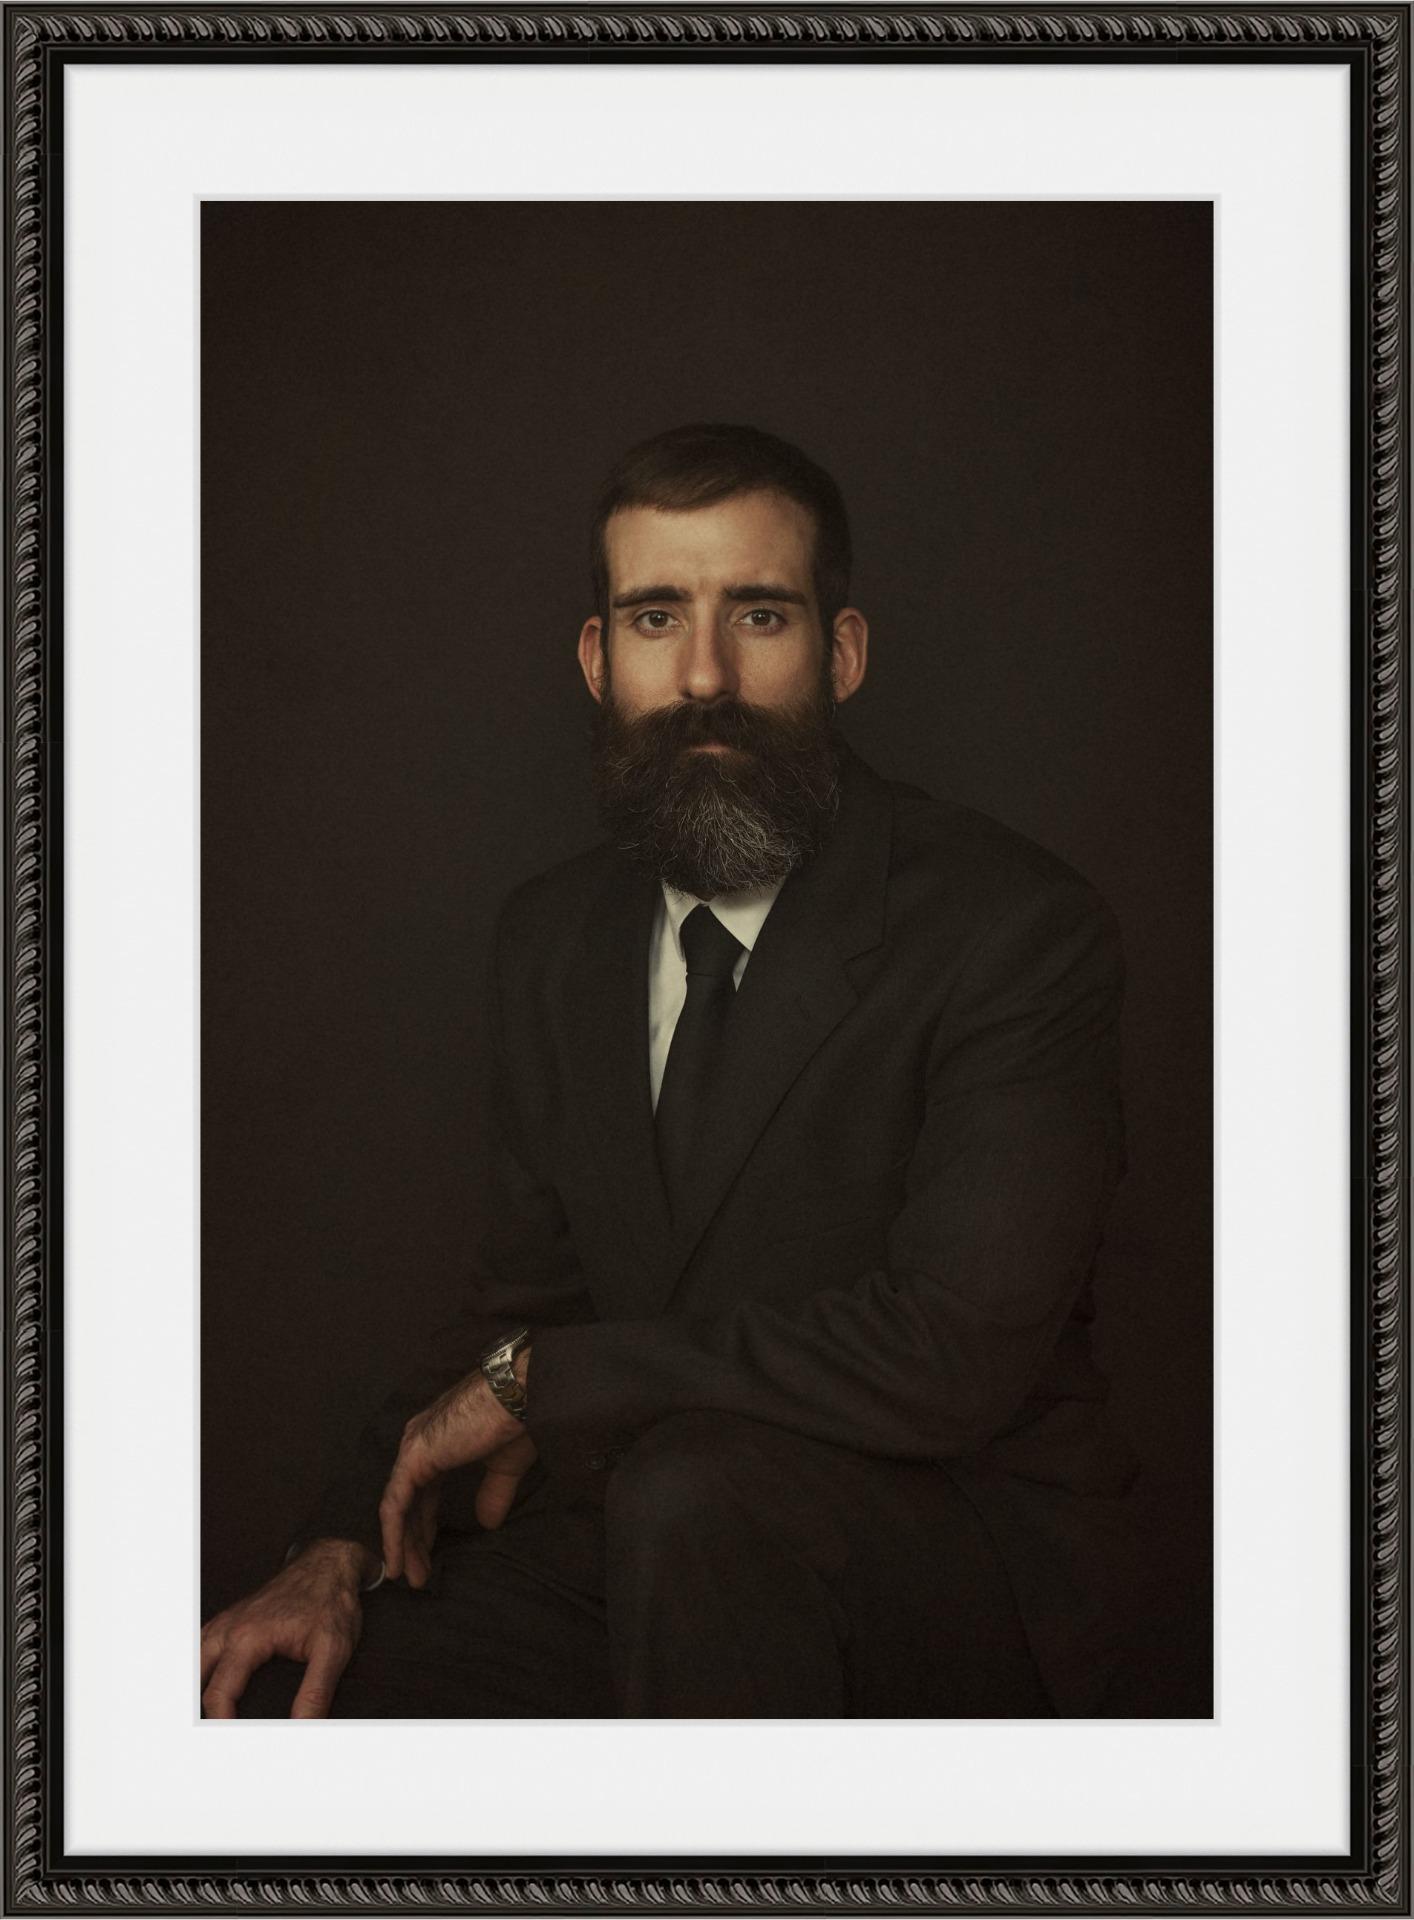 business_portrait_photography_pittsburgh_pa_jennifer_dworek.jpg